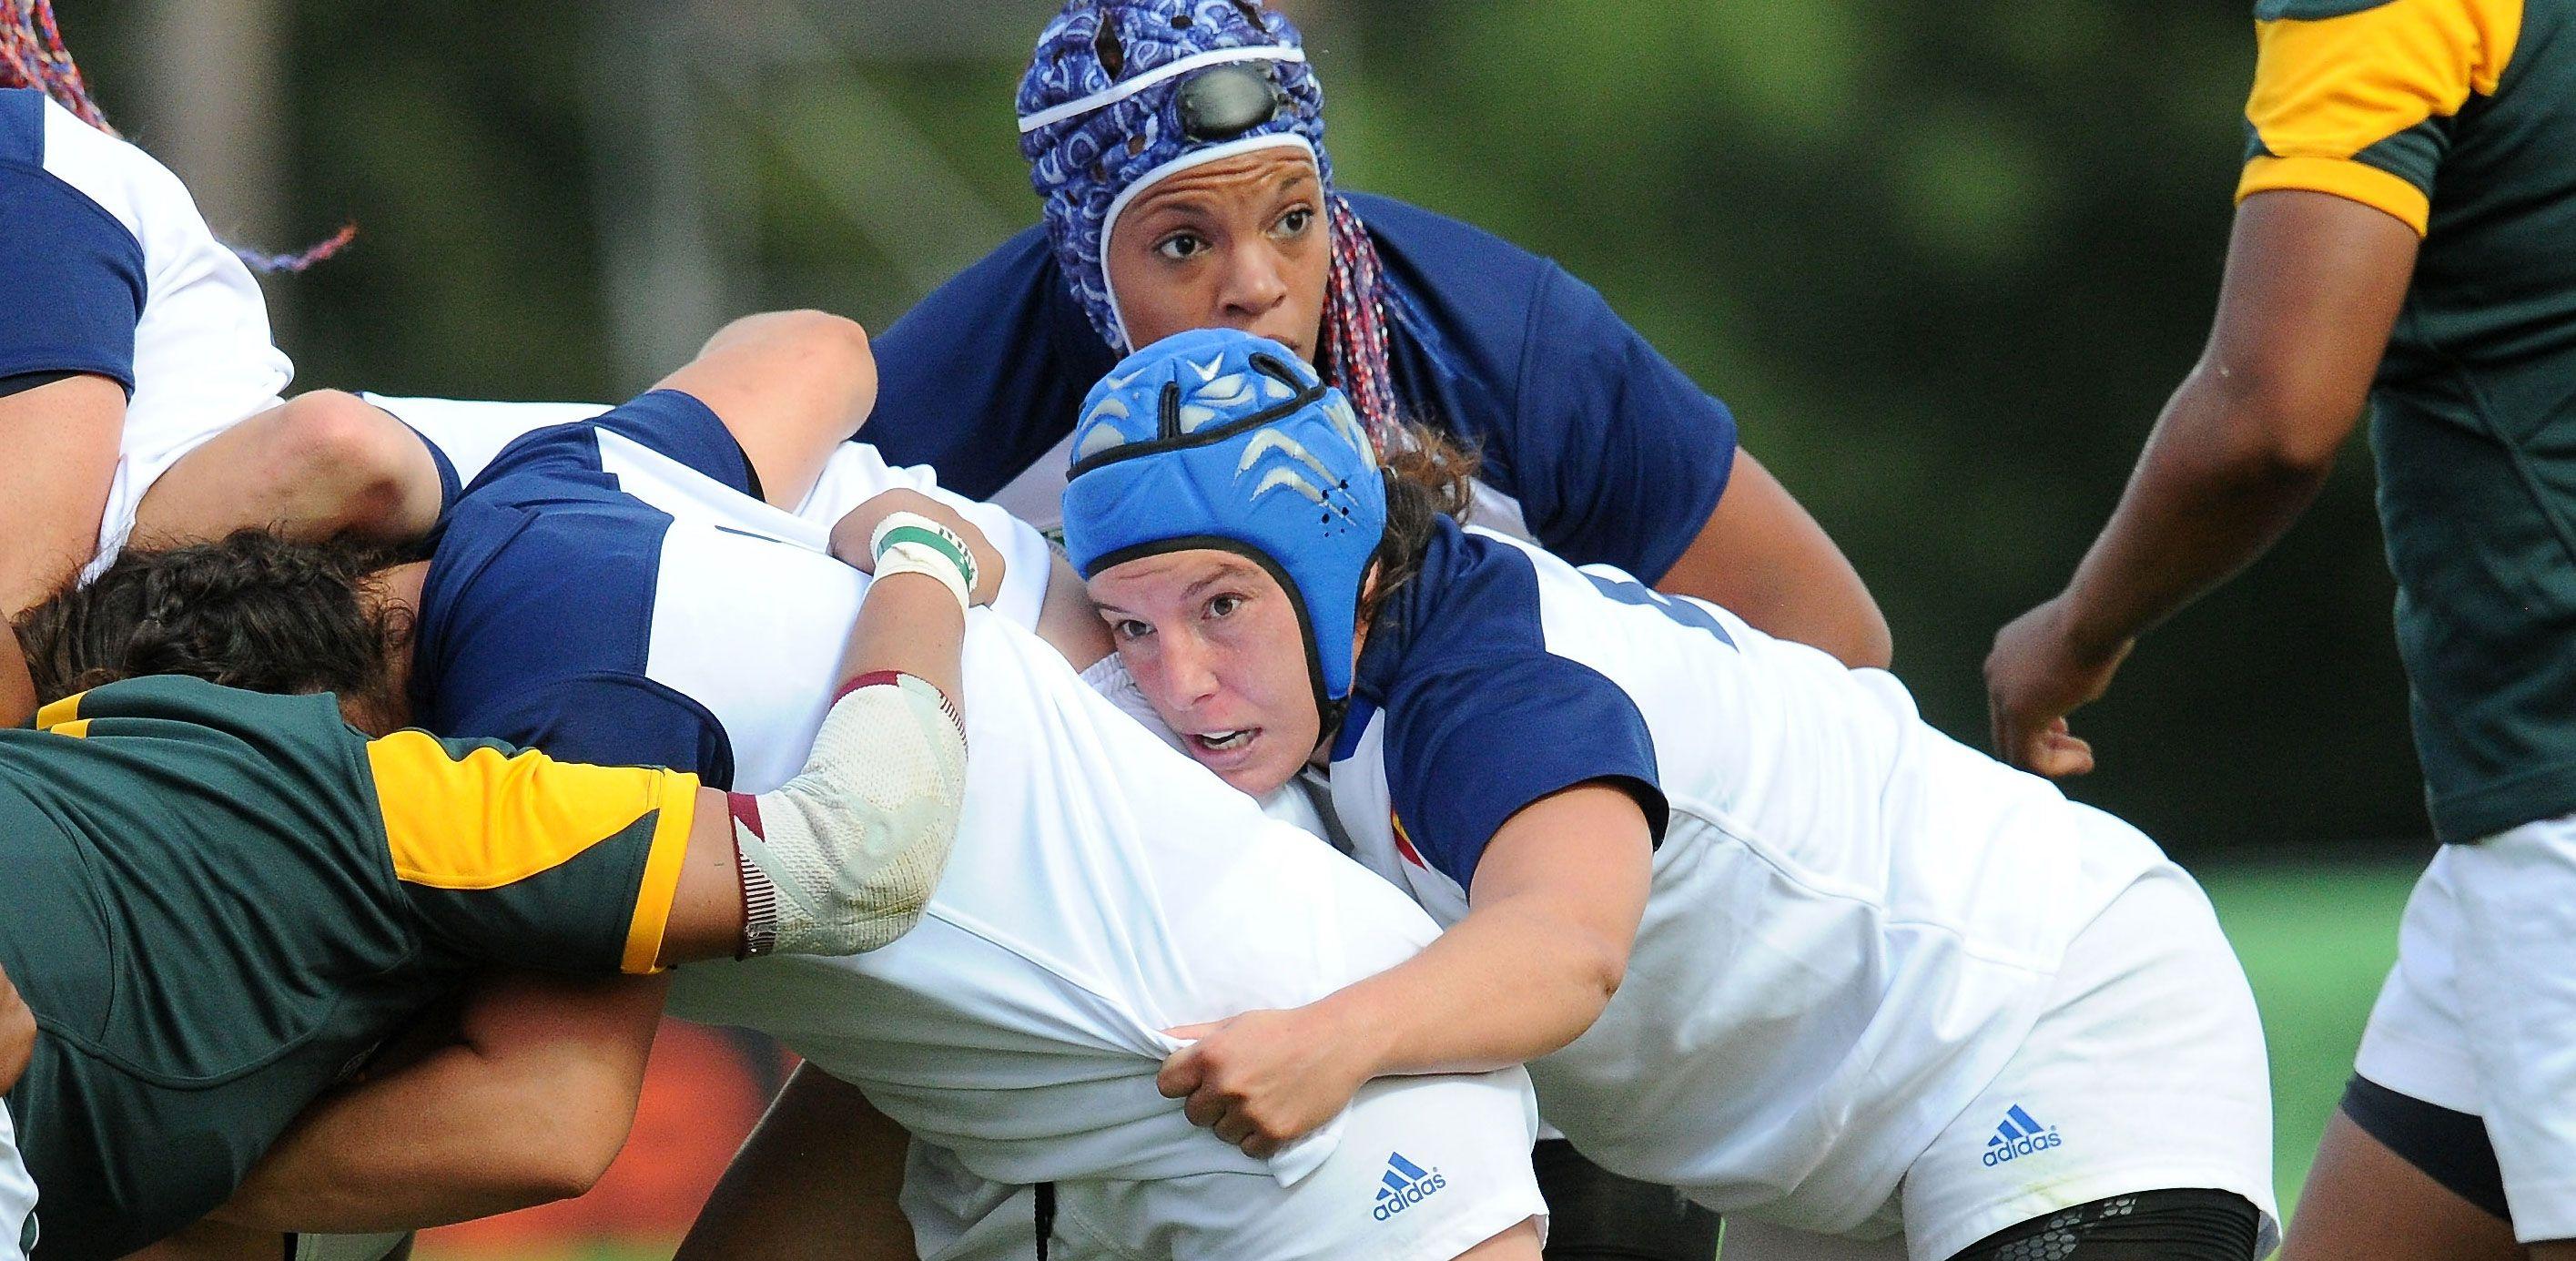 Le Championnat De France Feminin Attire Les Diffuseurs Rugby Feminin Rugby Championnat